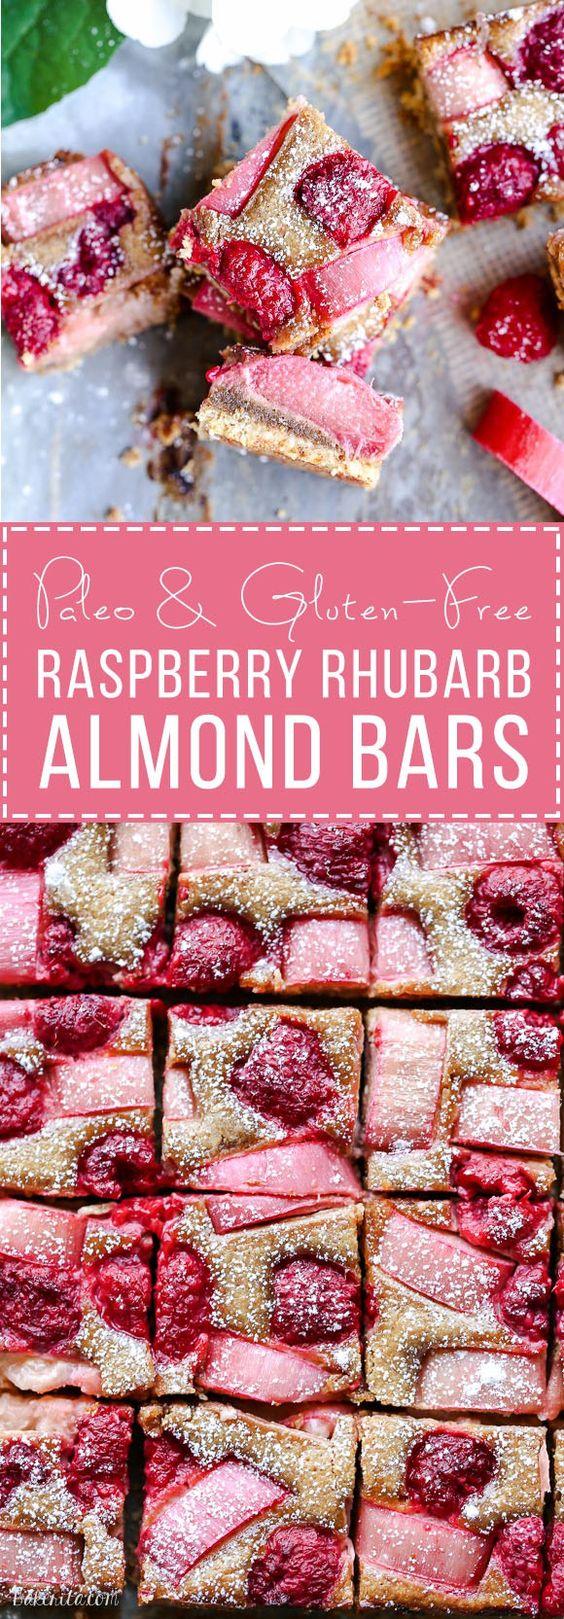 raspberry rhubarb almond bars - paleo, gluten free